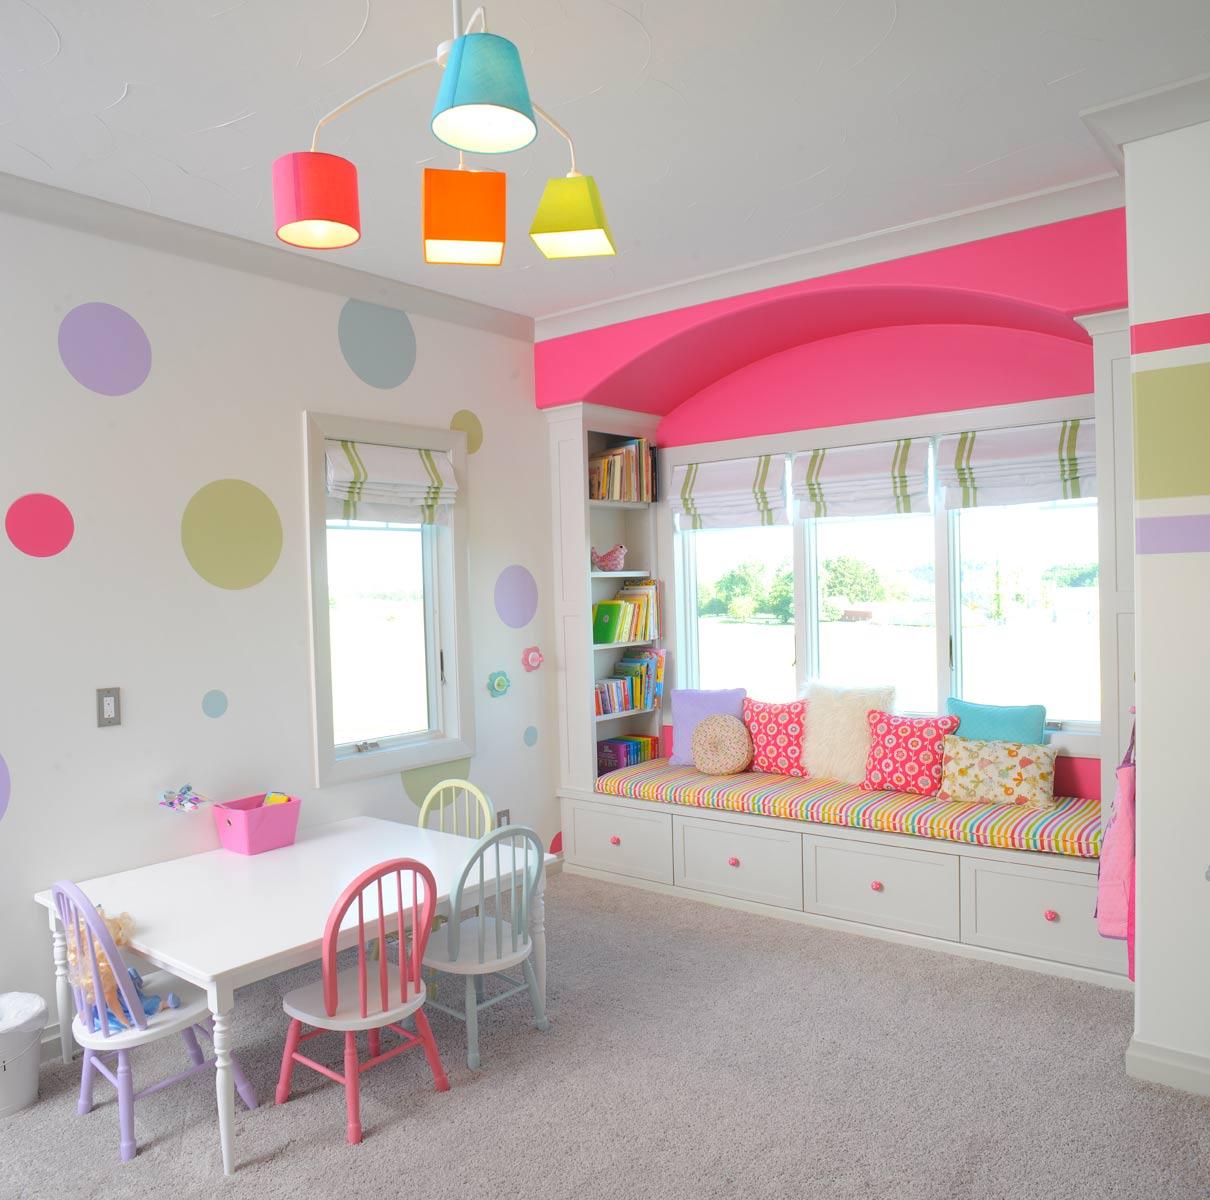 Colorful Playroom: Colorful Playroom